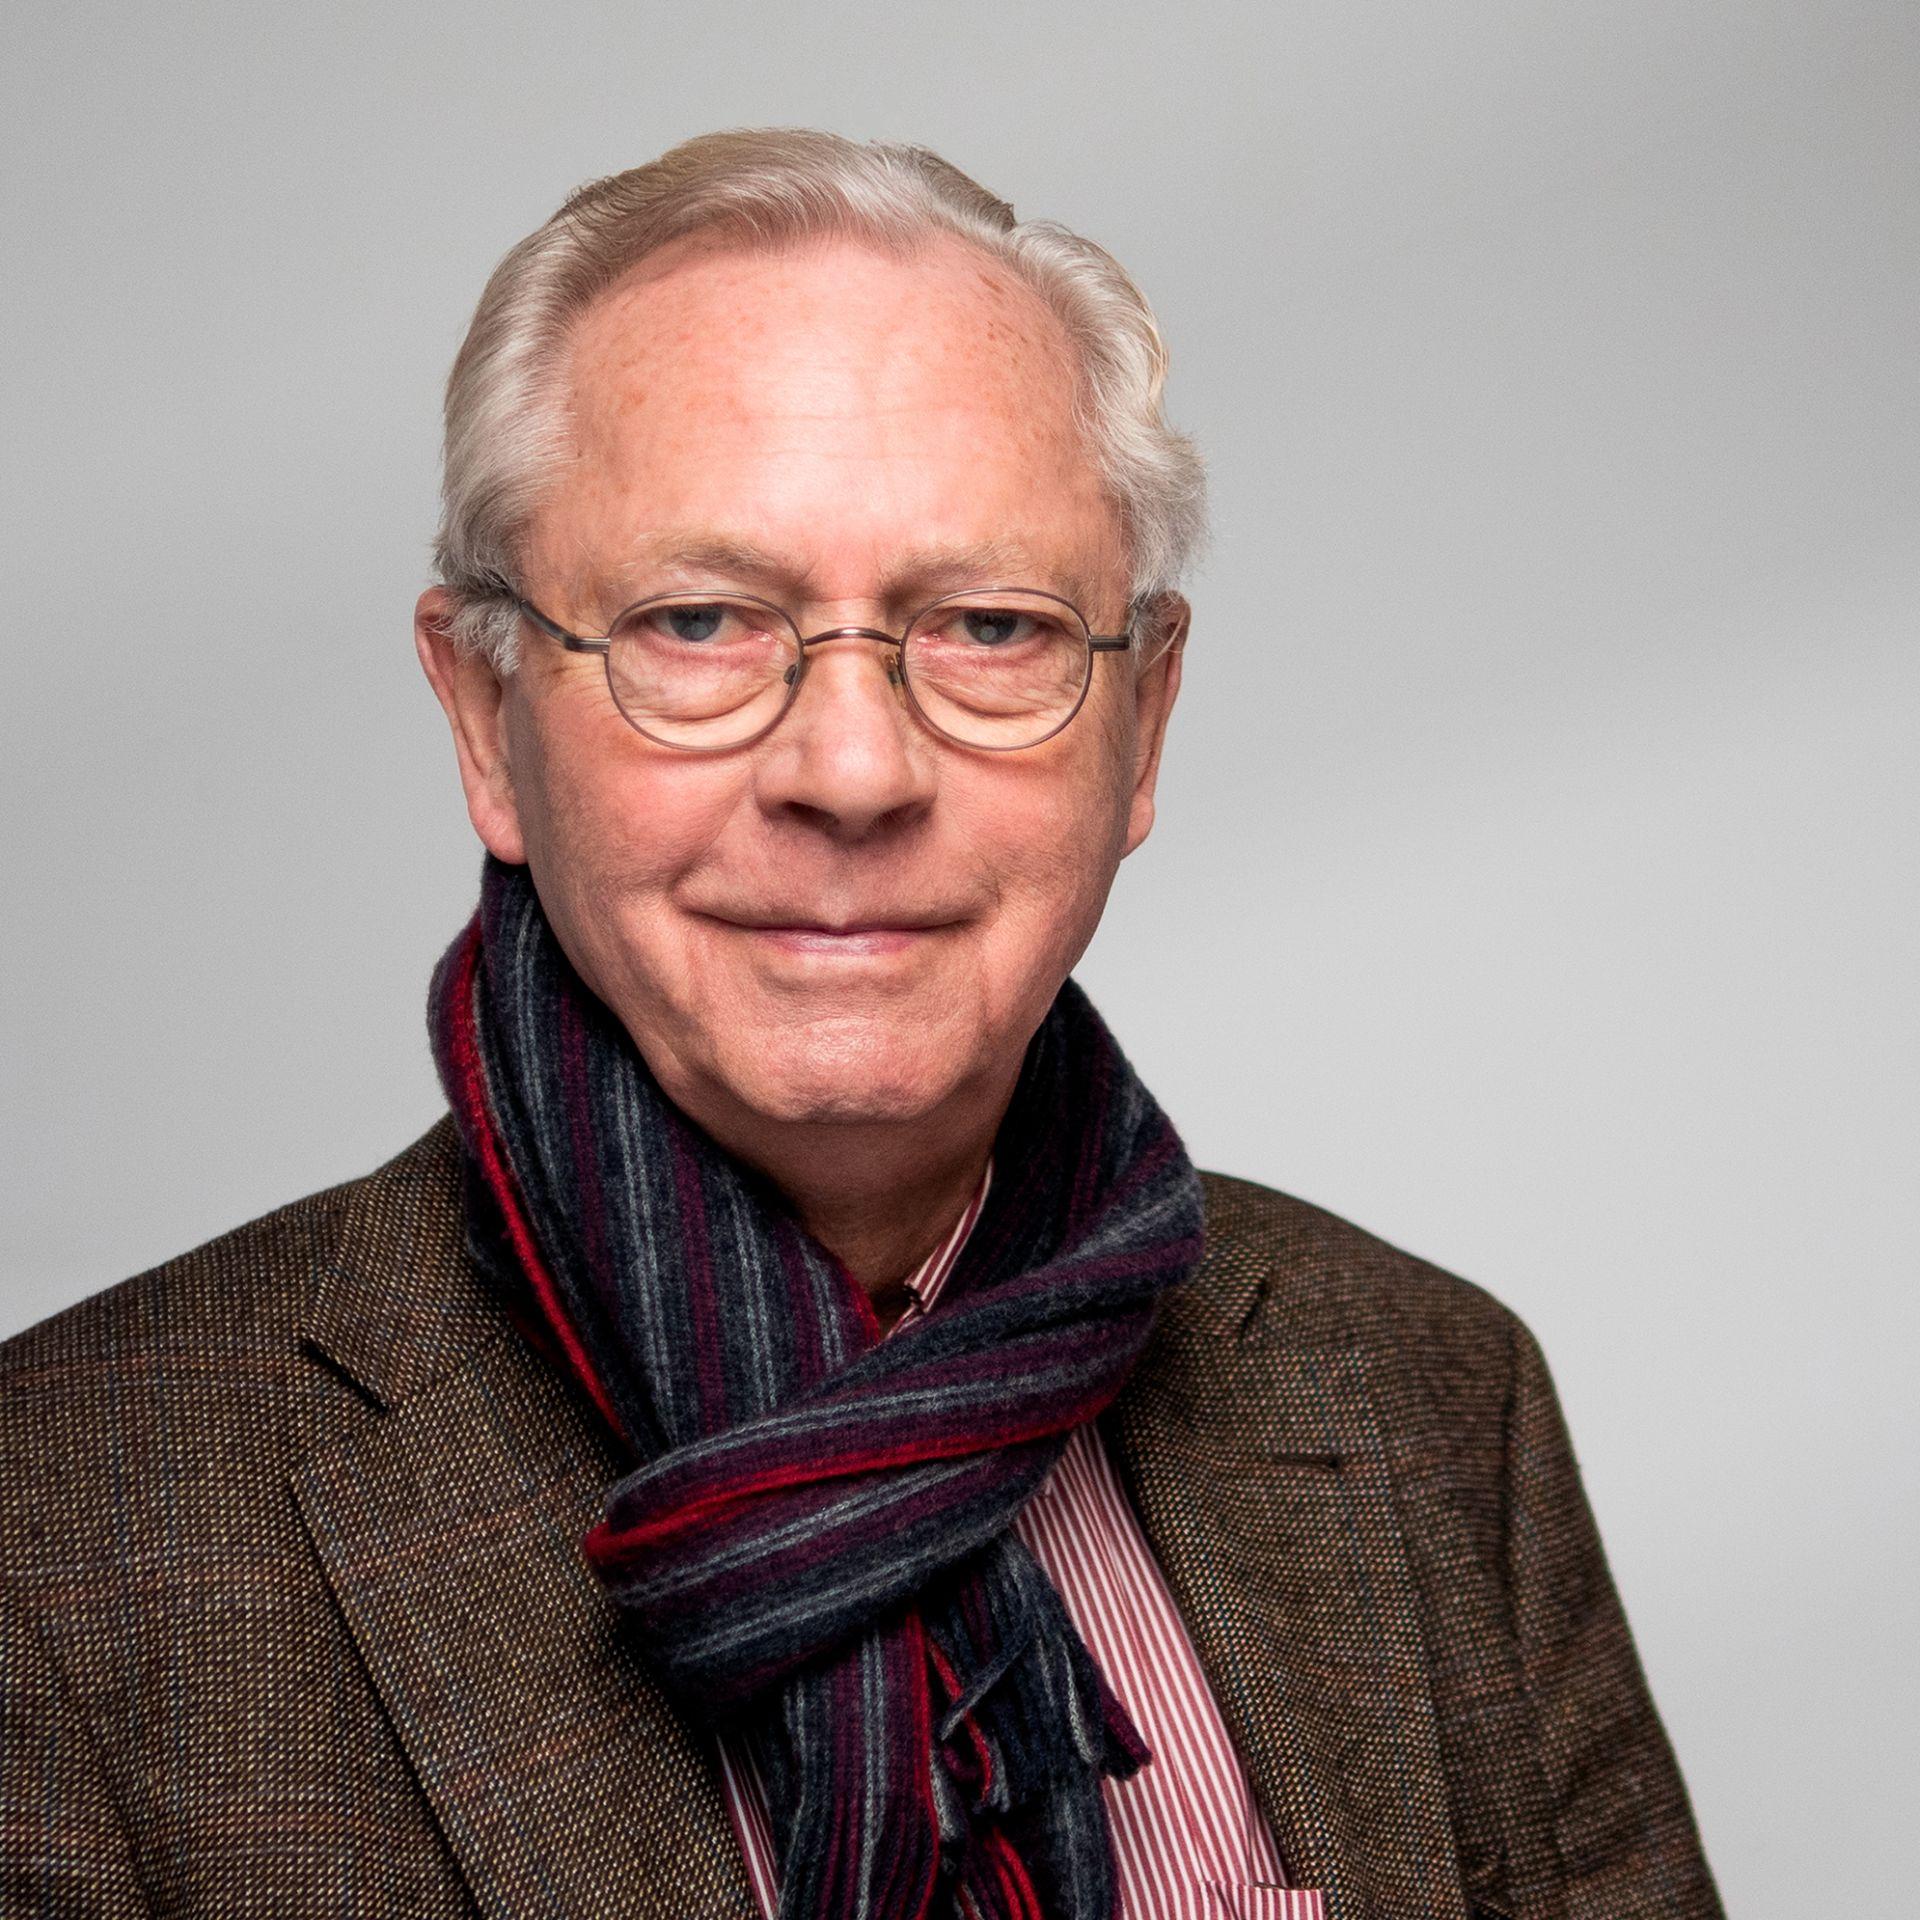 Uwe-Karsten Heye_Pressefoto 2020